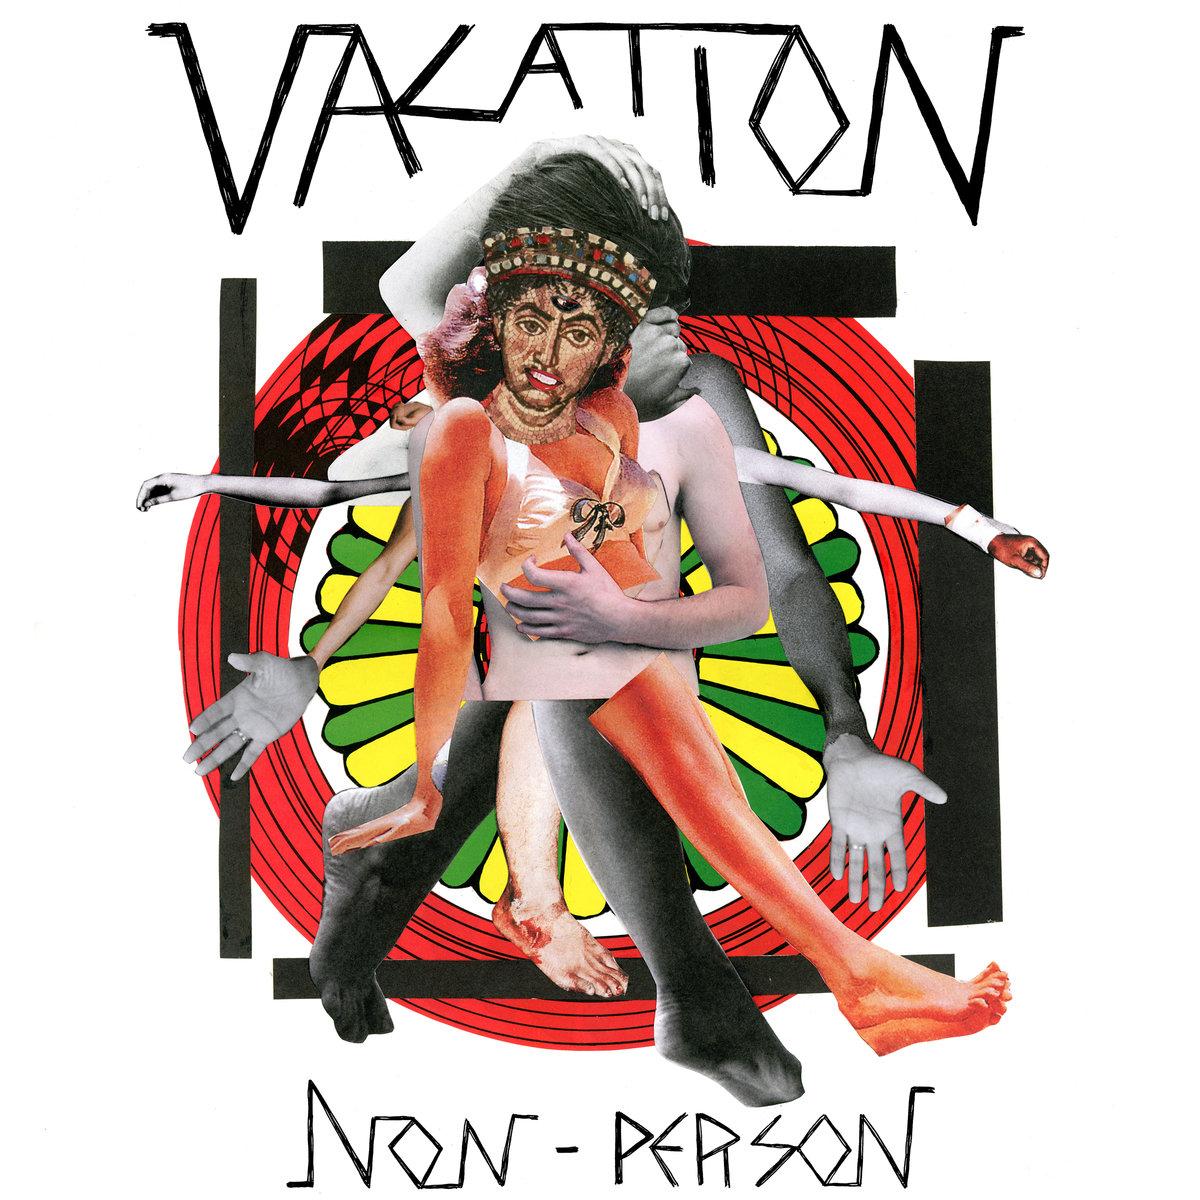 Vacation - Non Person LP